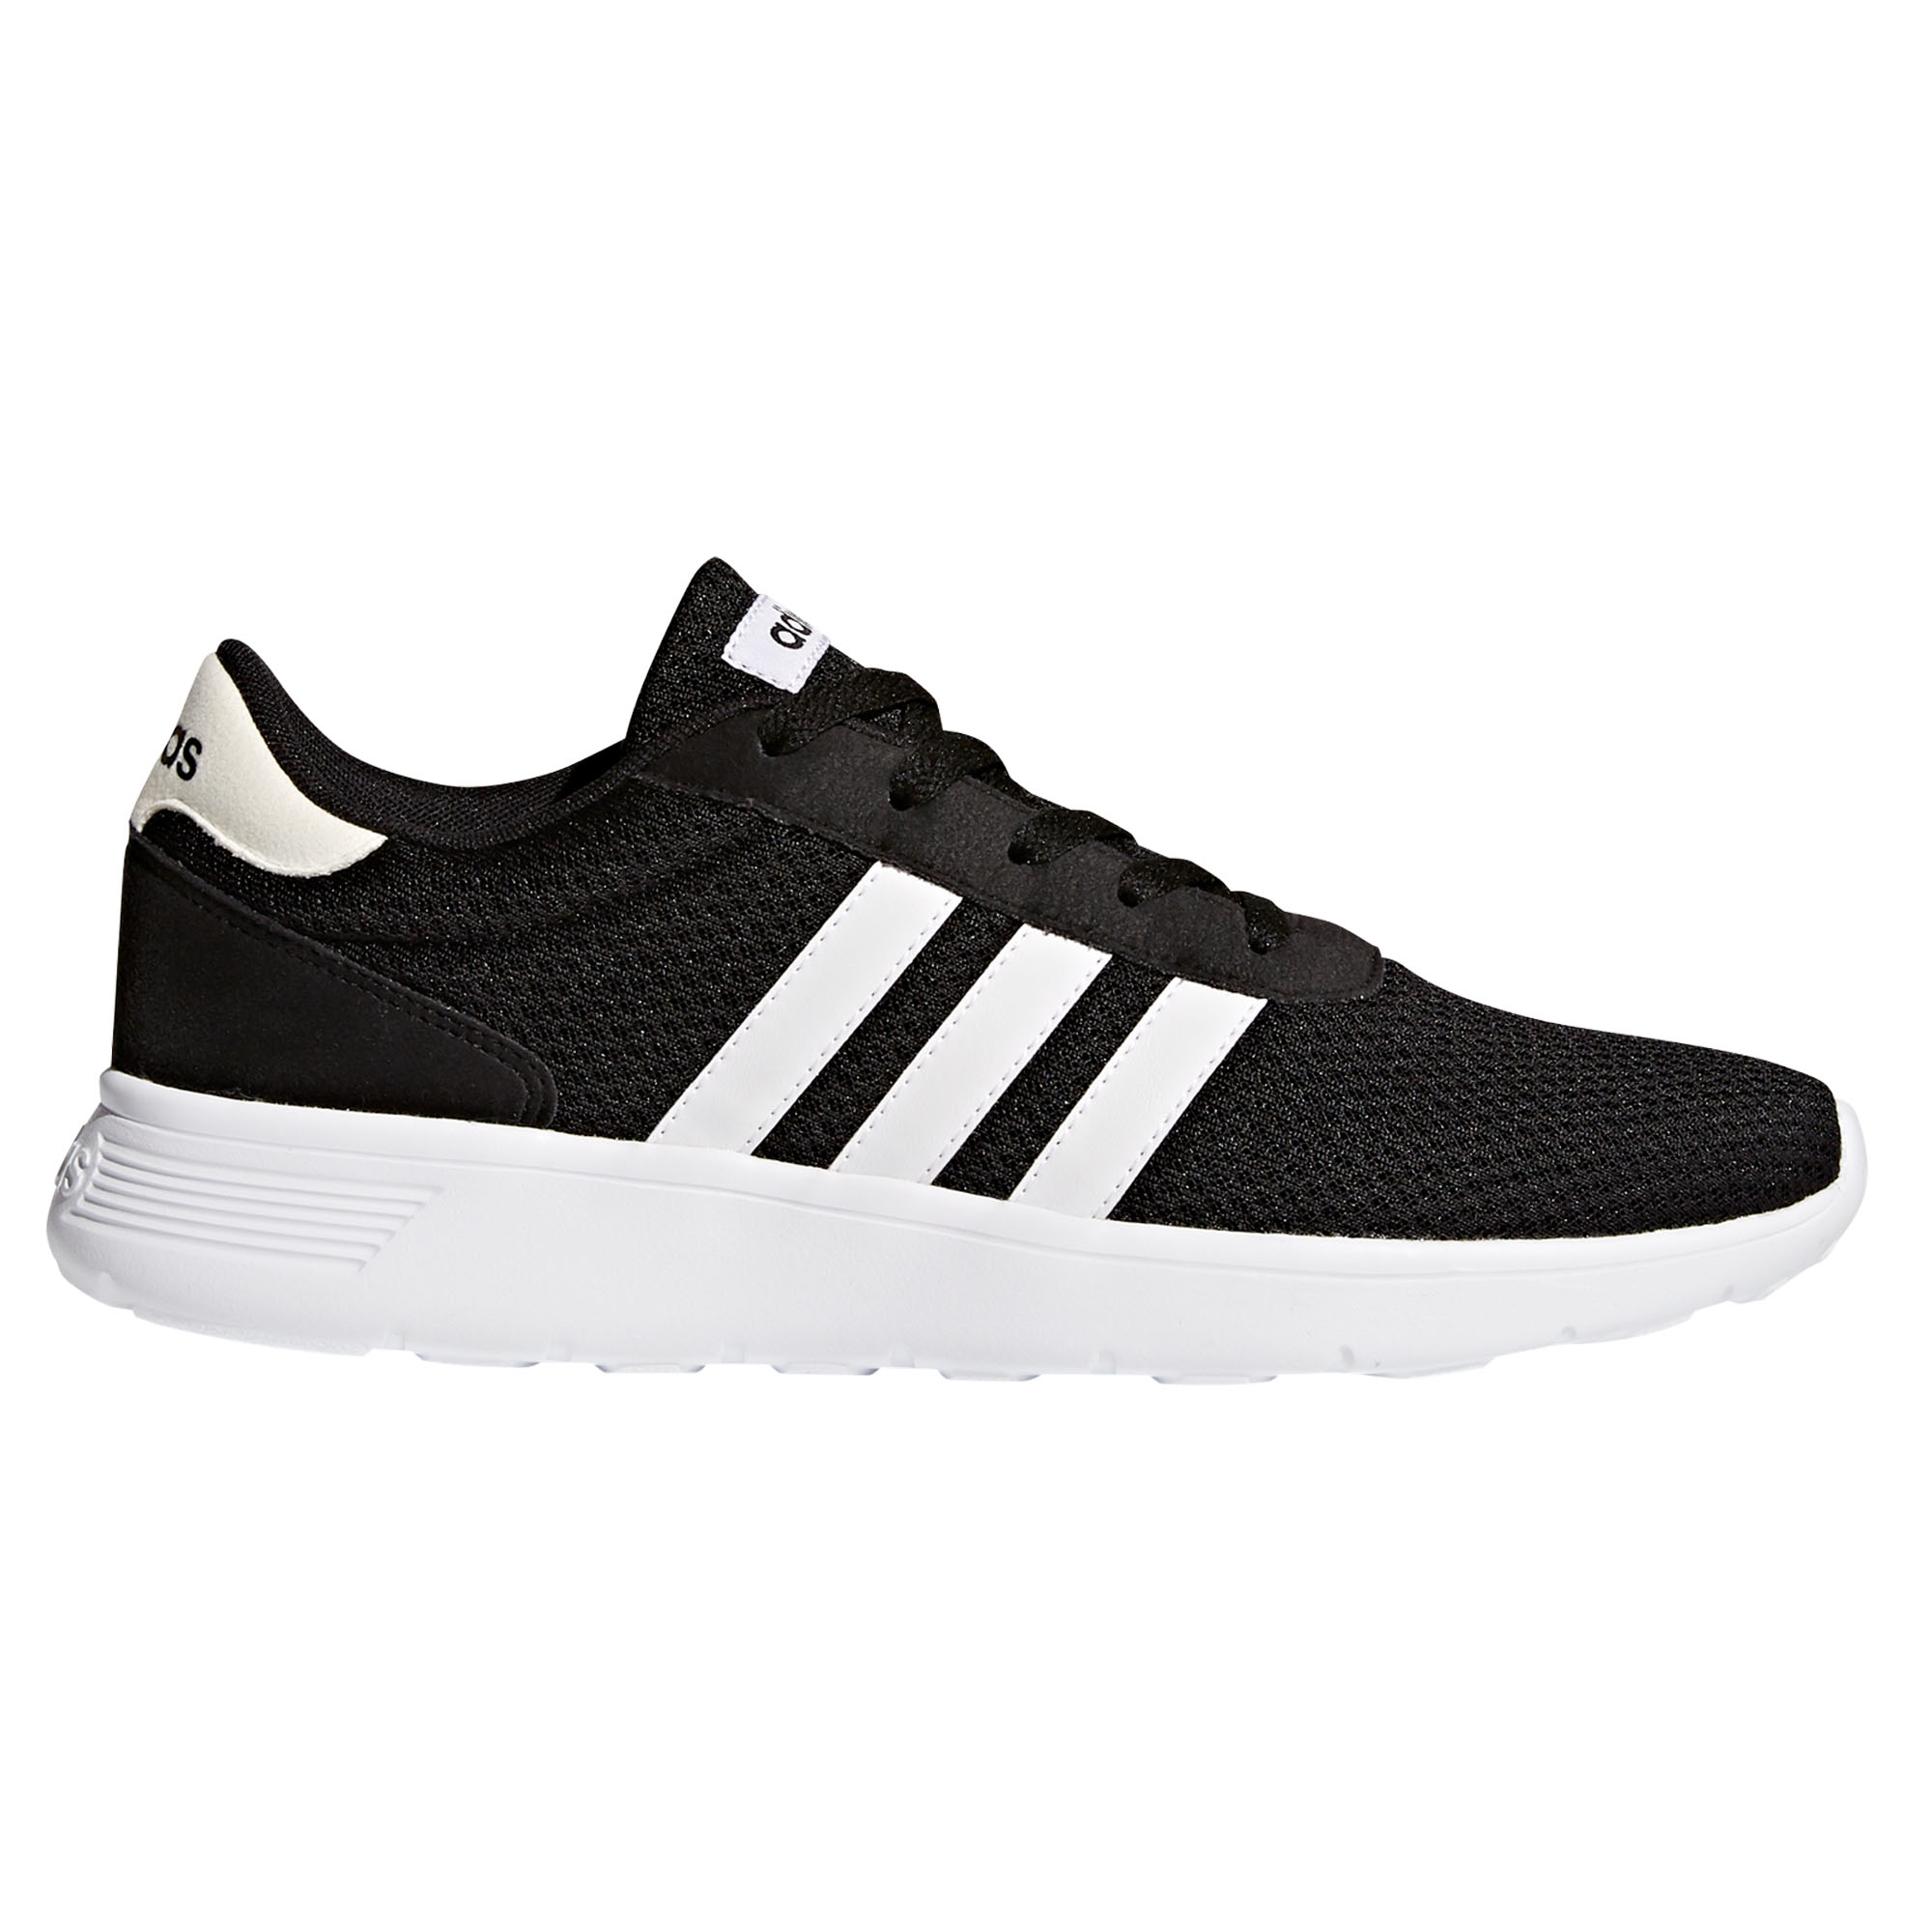 Adidas Pantaloncini da Boxe Dark VS Light Bianco L